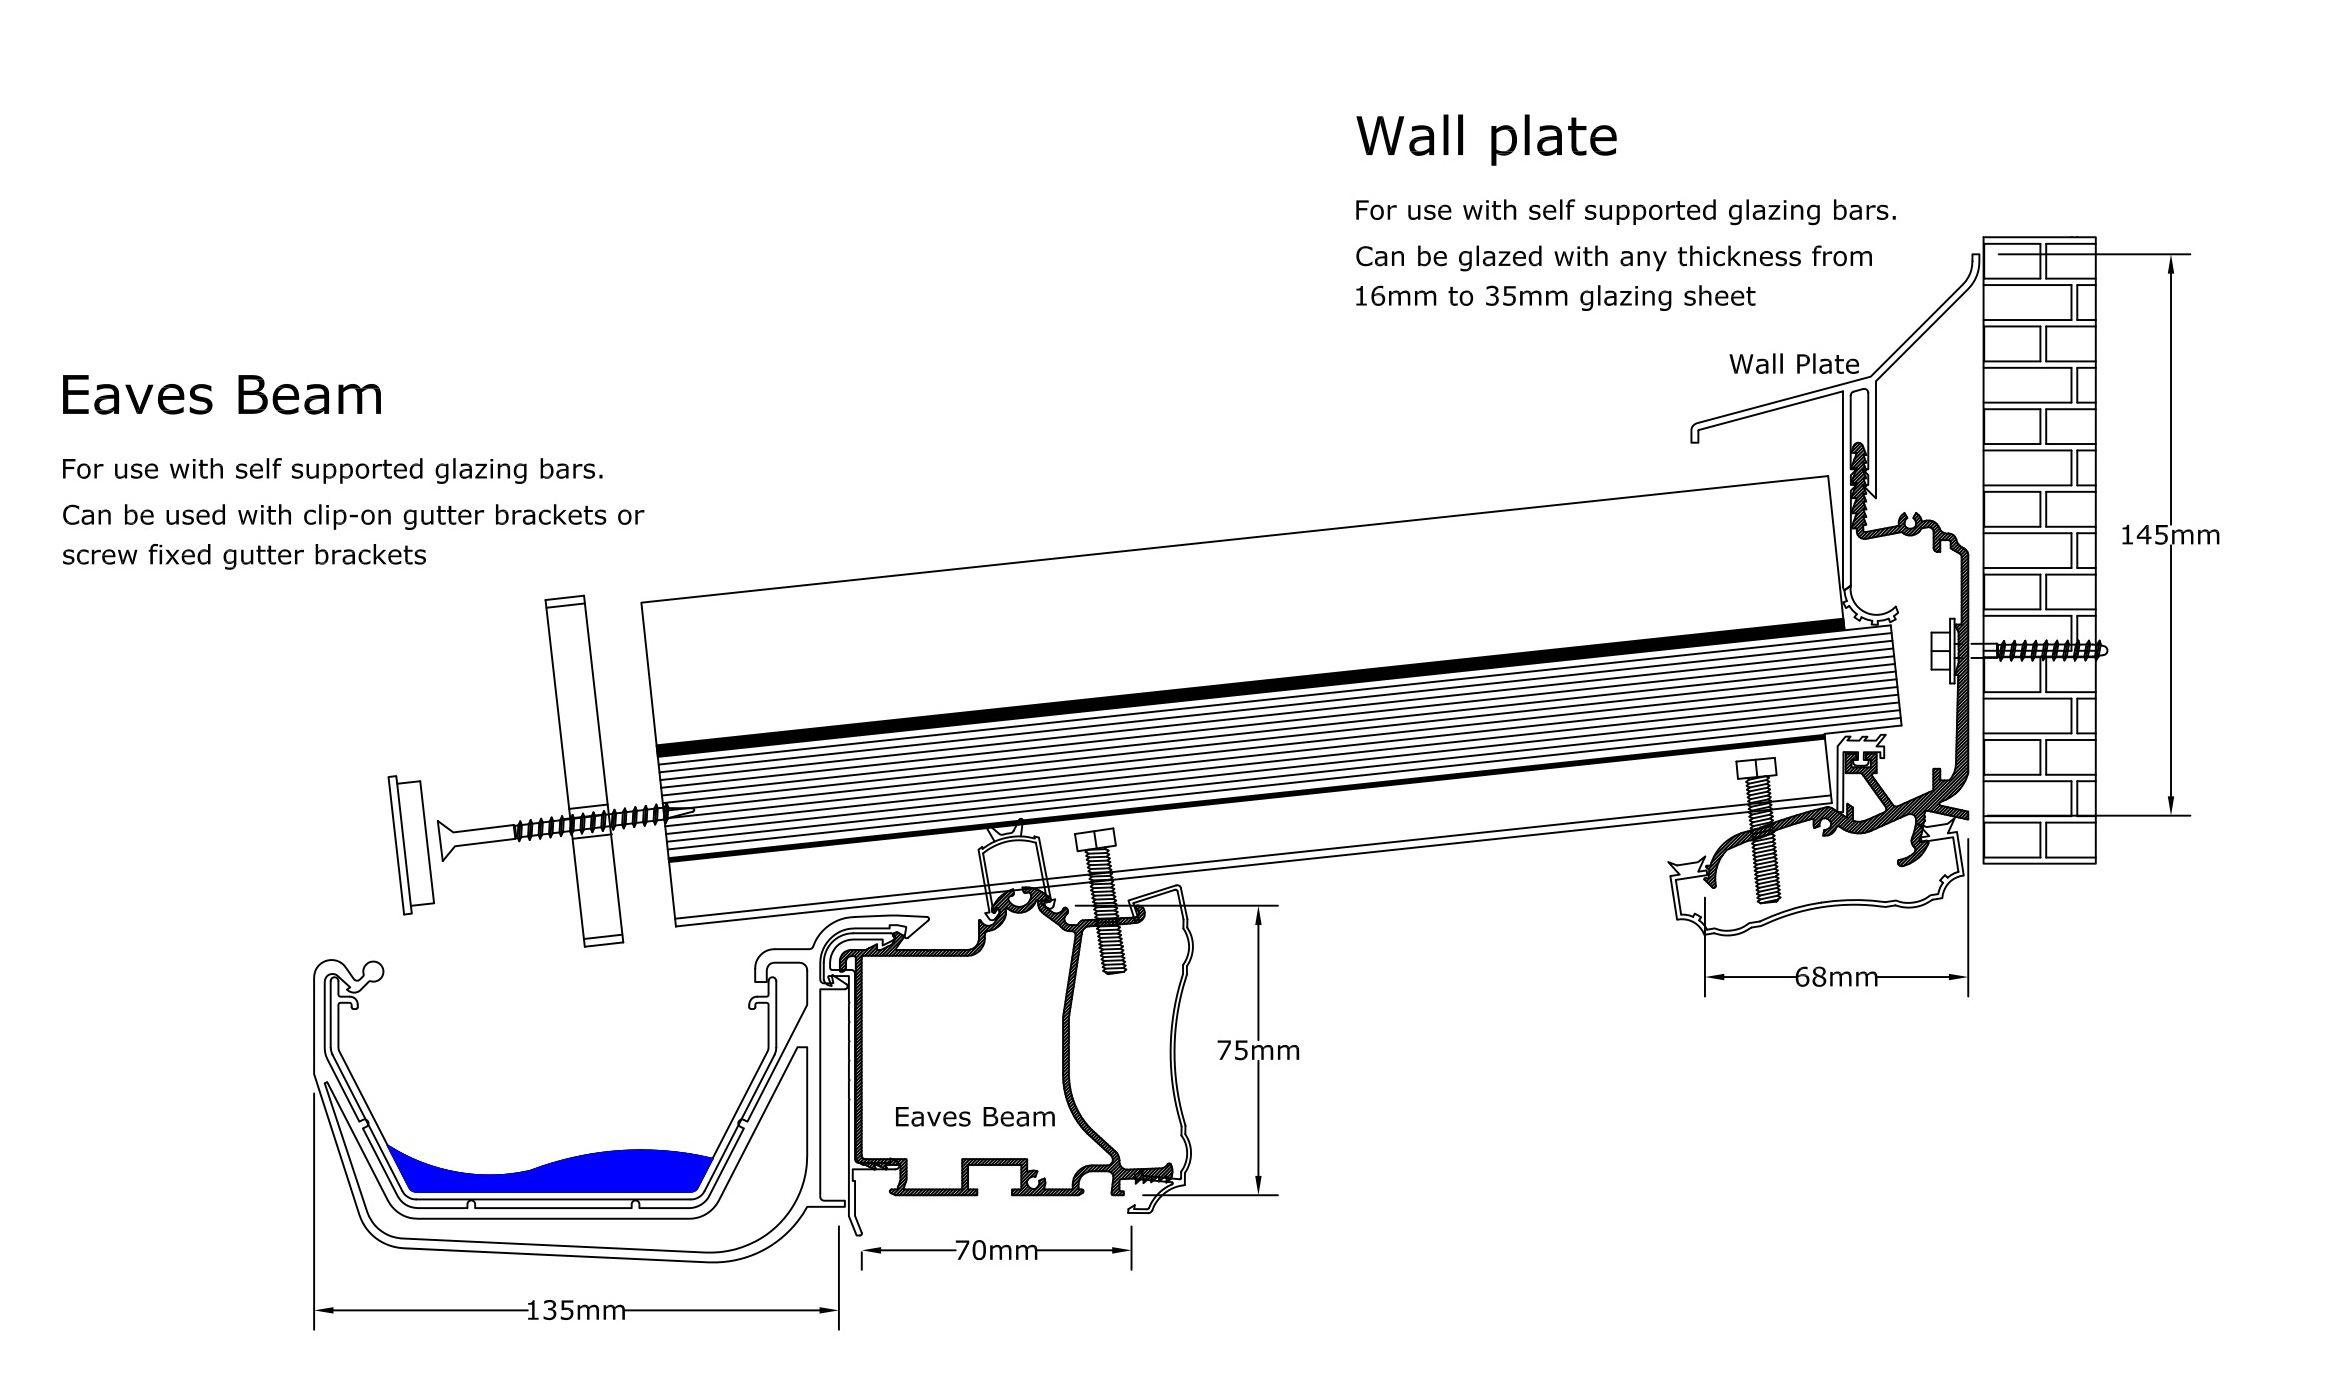 Polycarbonate Wall Plates Polycarbonate Panels Plates On Wall Twin Wall Polycarbonate Sheet